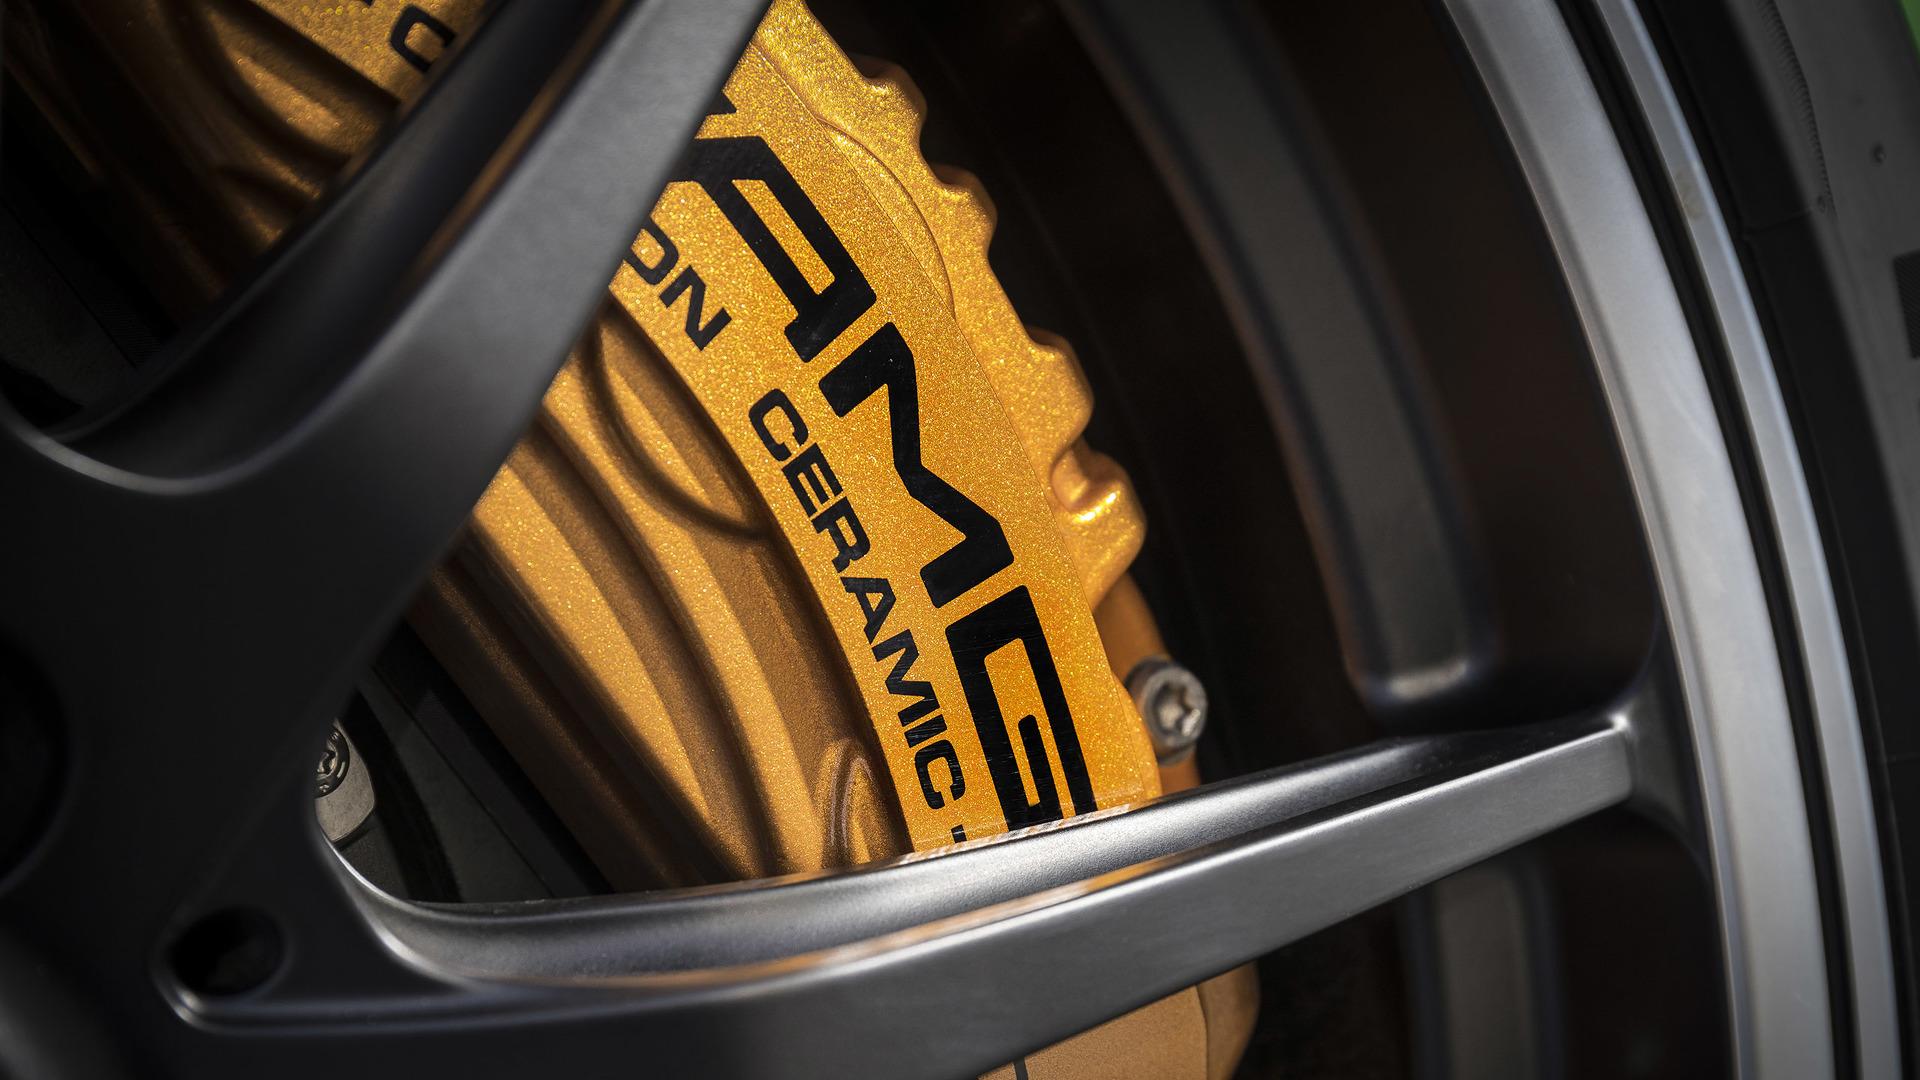 Суперкар Mercedes-AMG GT R снимают с производства